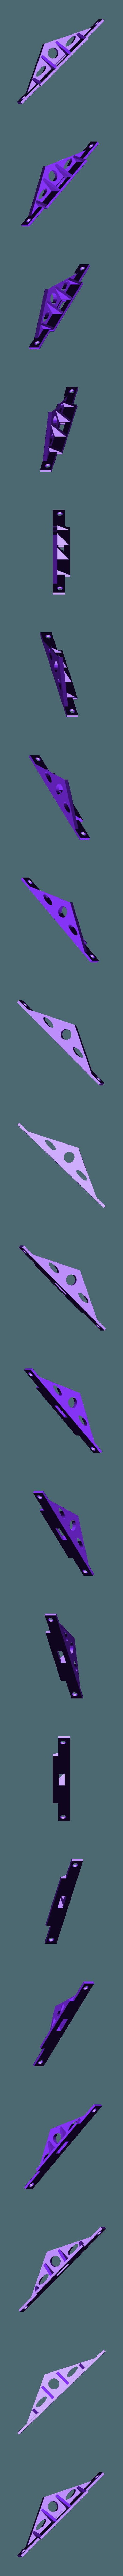 Obtegach (5).stl Download STL file Reinforcement for the Raiscube R2 strap • Design to 3D print, jankitokarczew